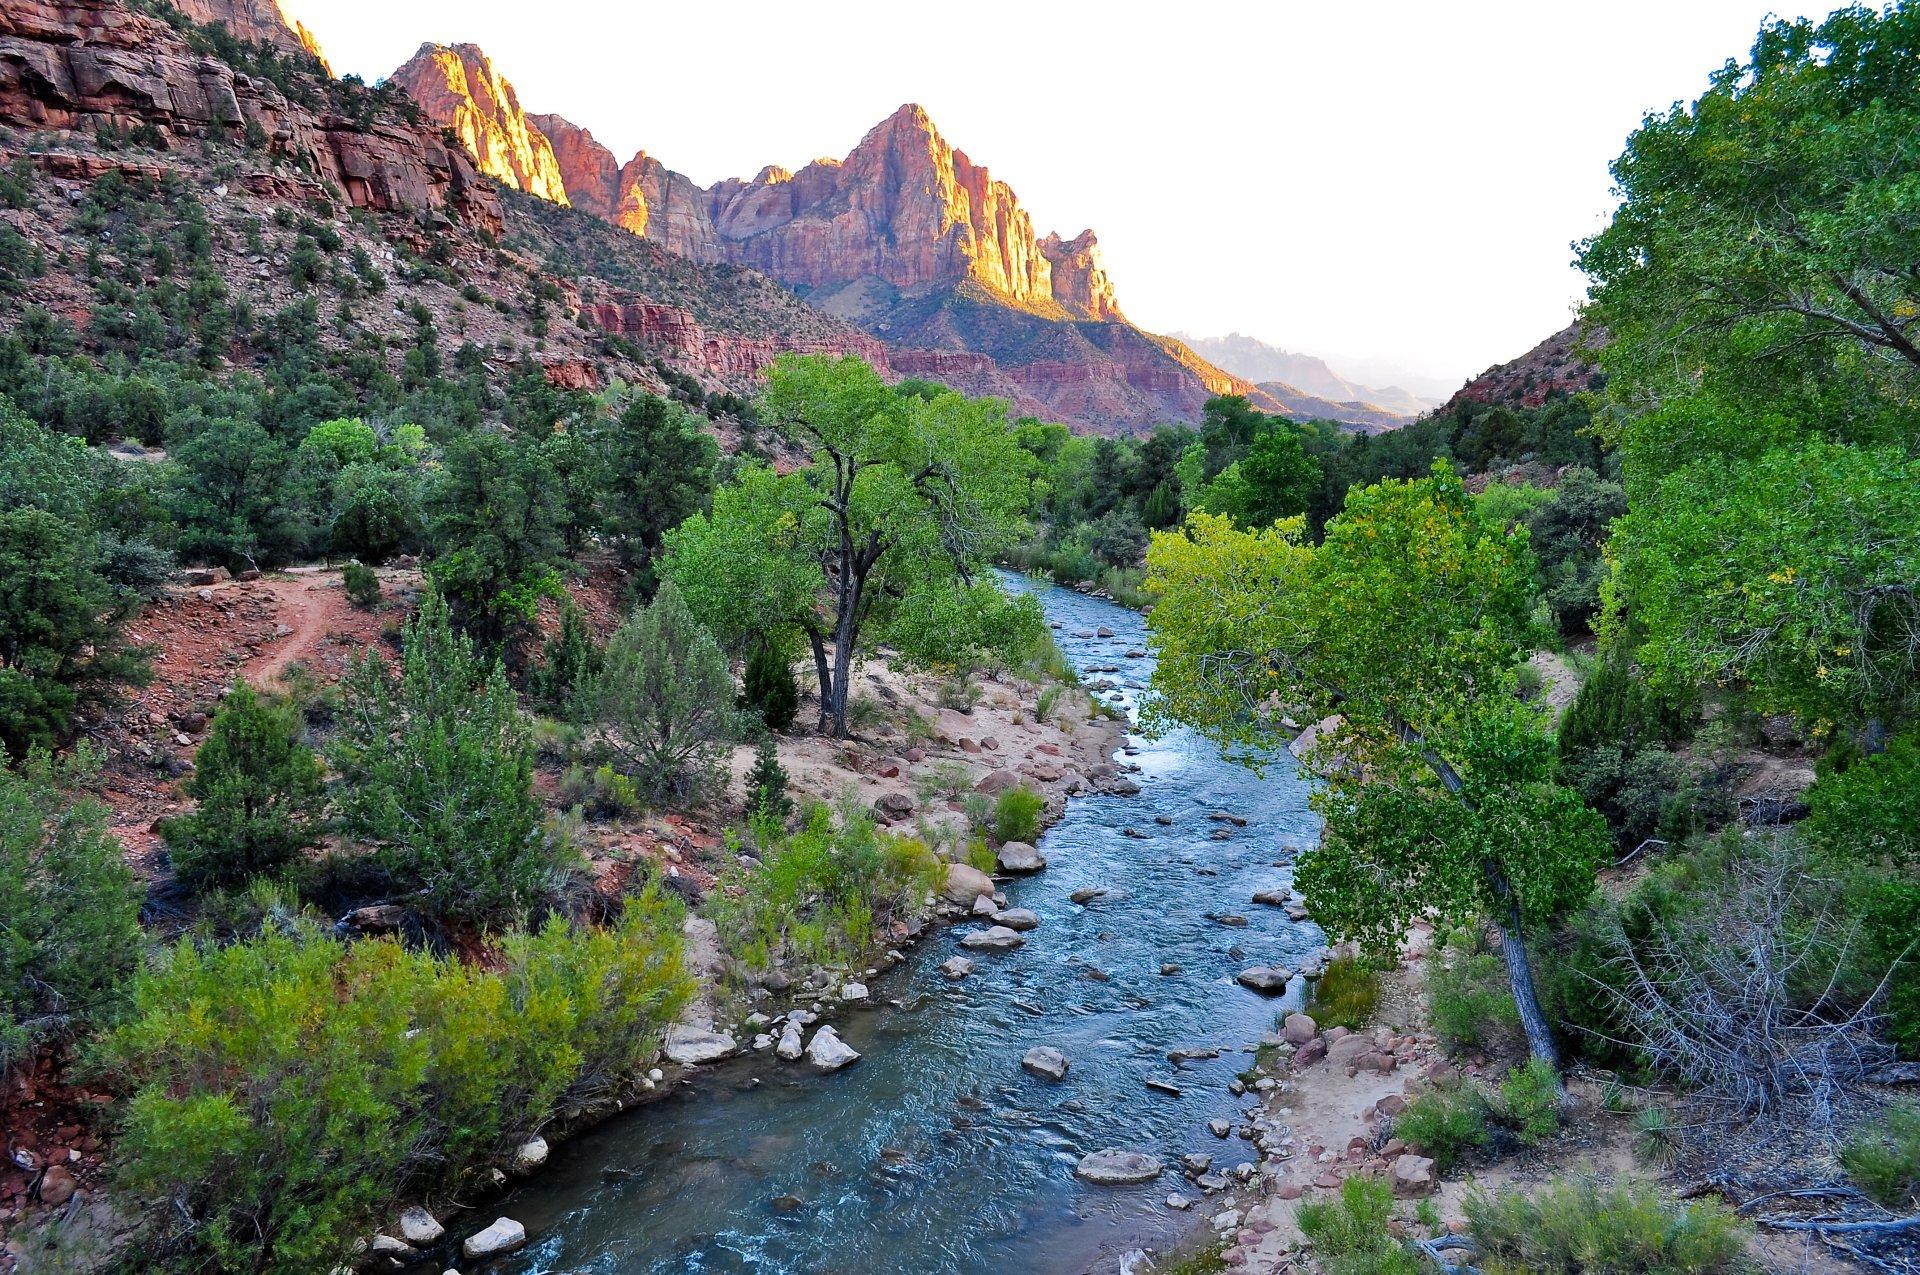 Обои Zion national park, сша, ручей, водопад, юта, скалы. Природа foto 15